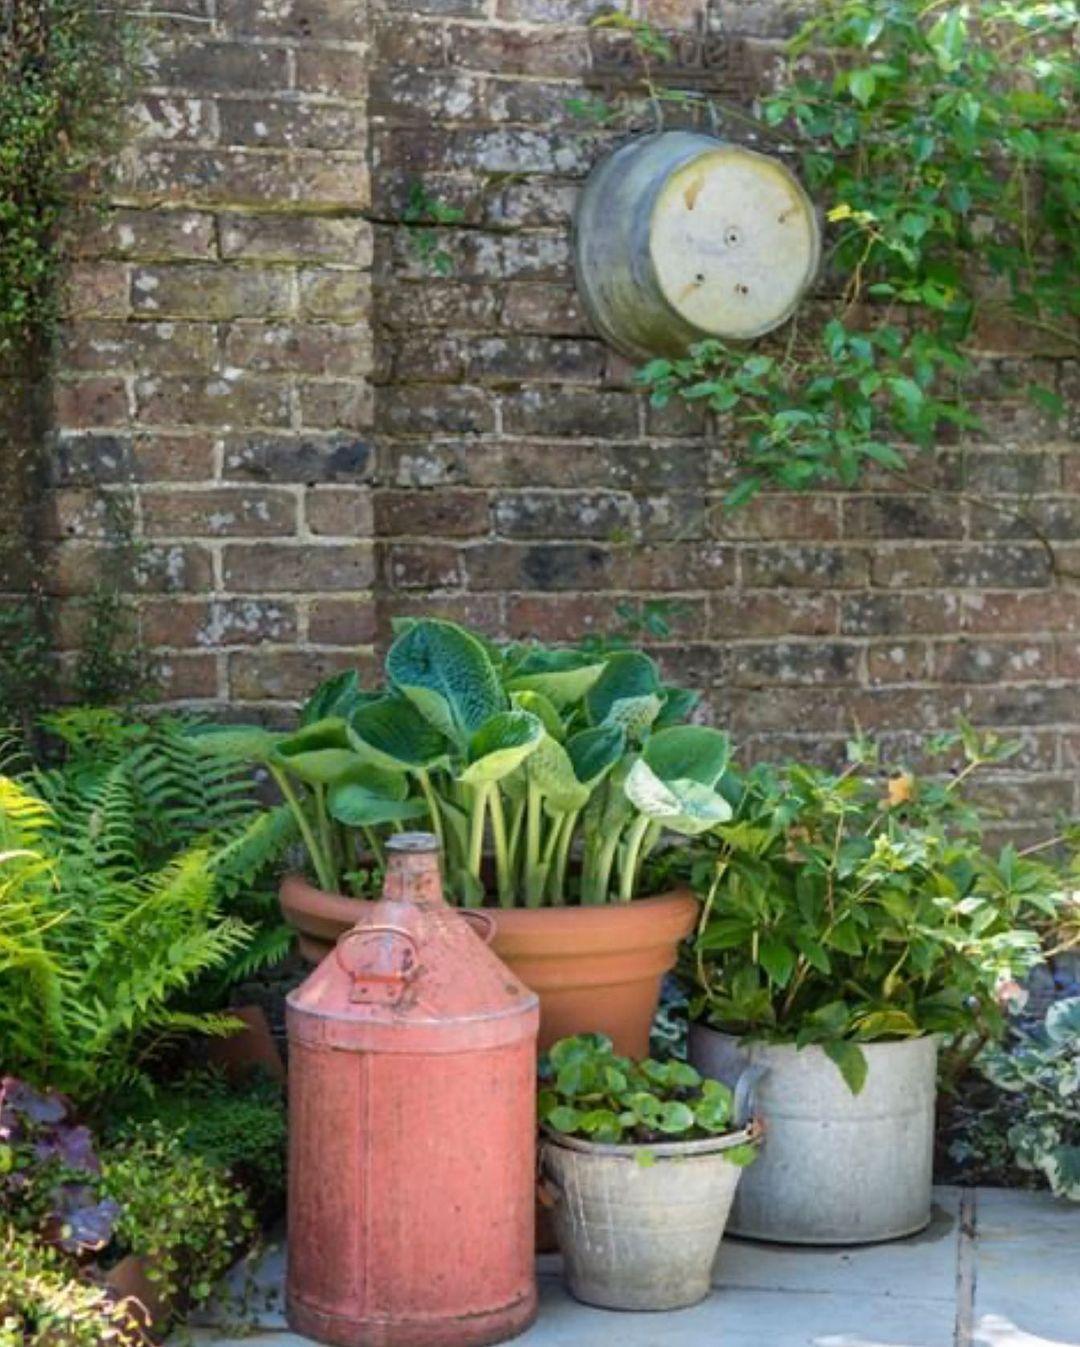 "Small Magical Garden Spaces on Instagram: ""💚🌿🍃 #smallmagicalgardens #smallgarden #gardendesign #gardening #courtyardgarden #redbrickwall #containergardening #galvanisedplanter…"""